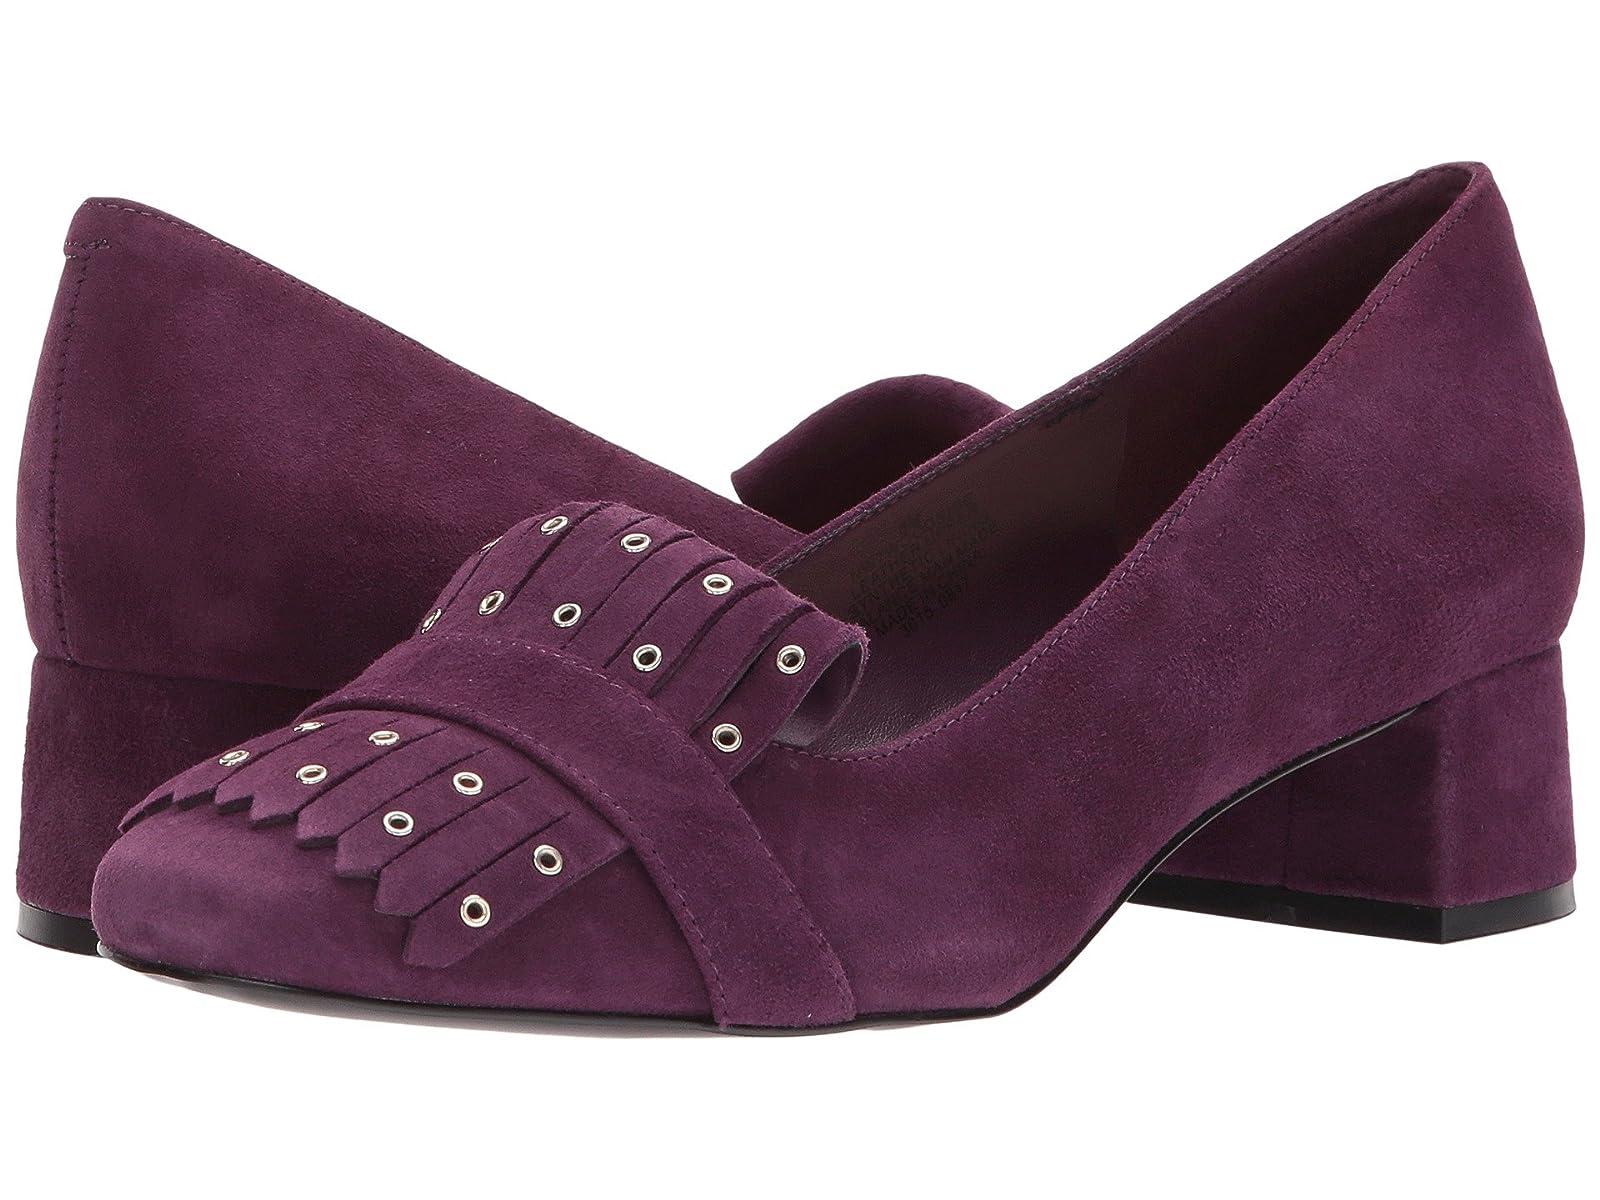 Nine West WoodsideCheap and distinctive eye-catching shoes